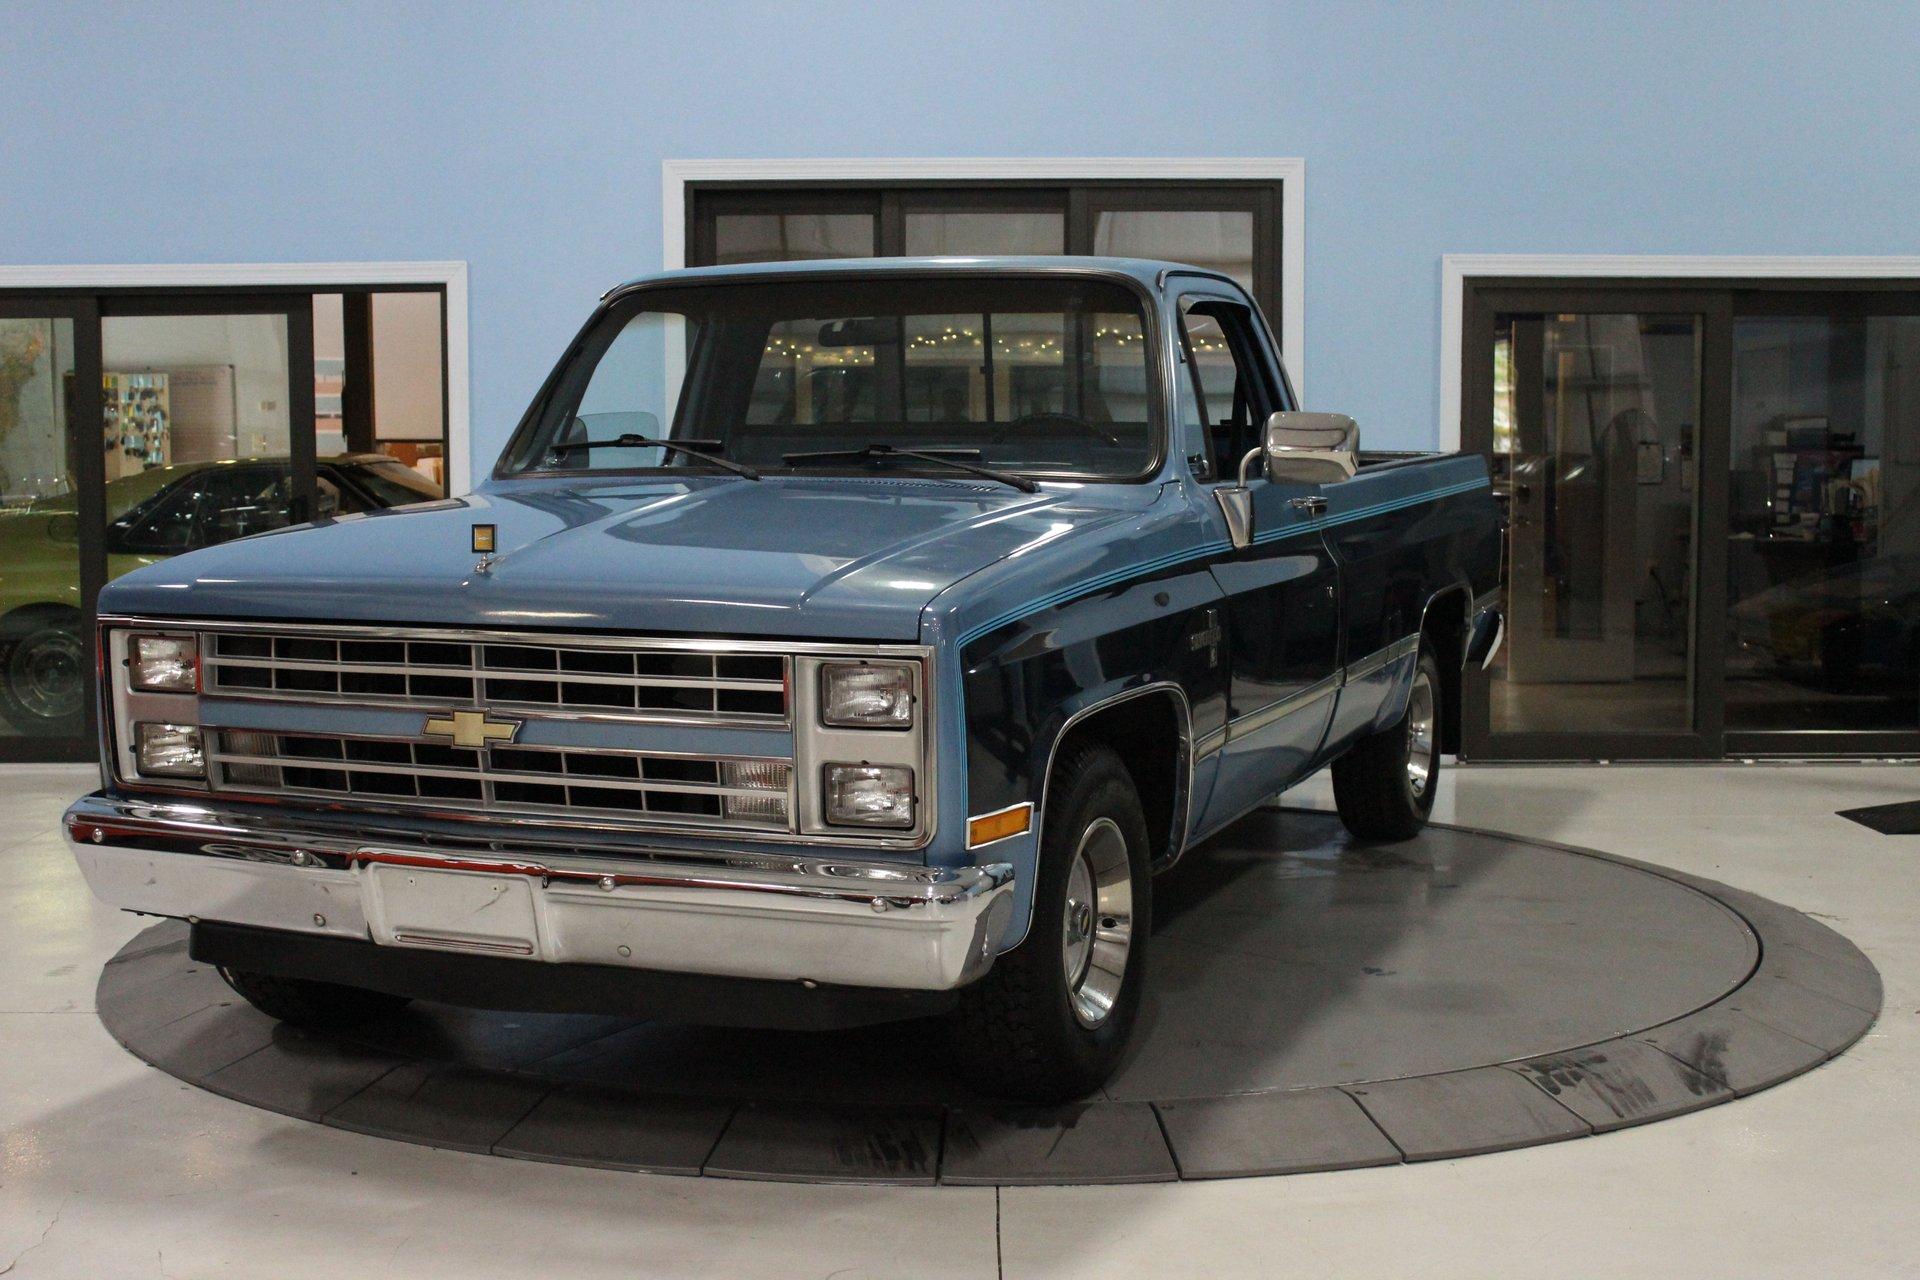 1987 Chevrolet Silverado Classic Cars Used Cars For Sale In Tampa Fl